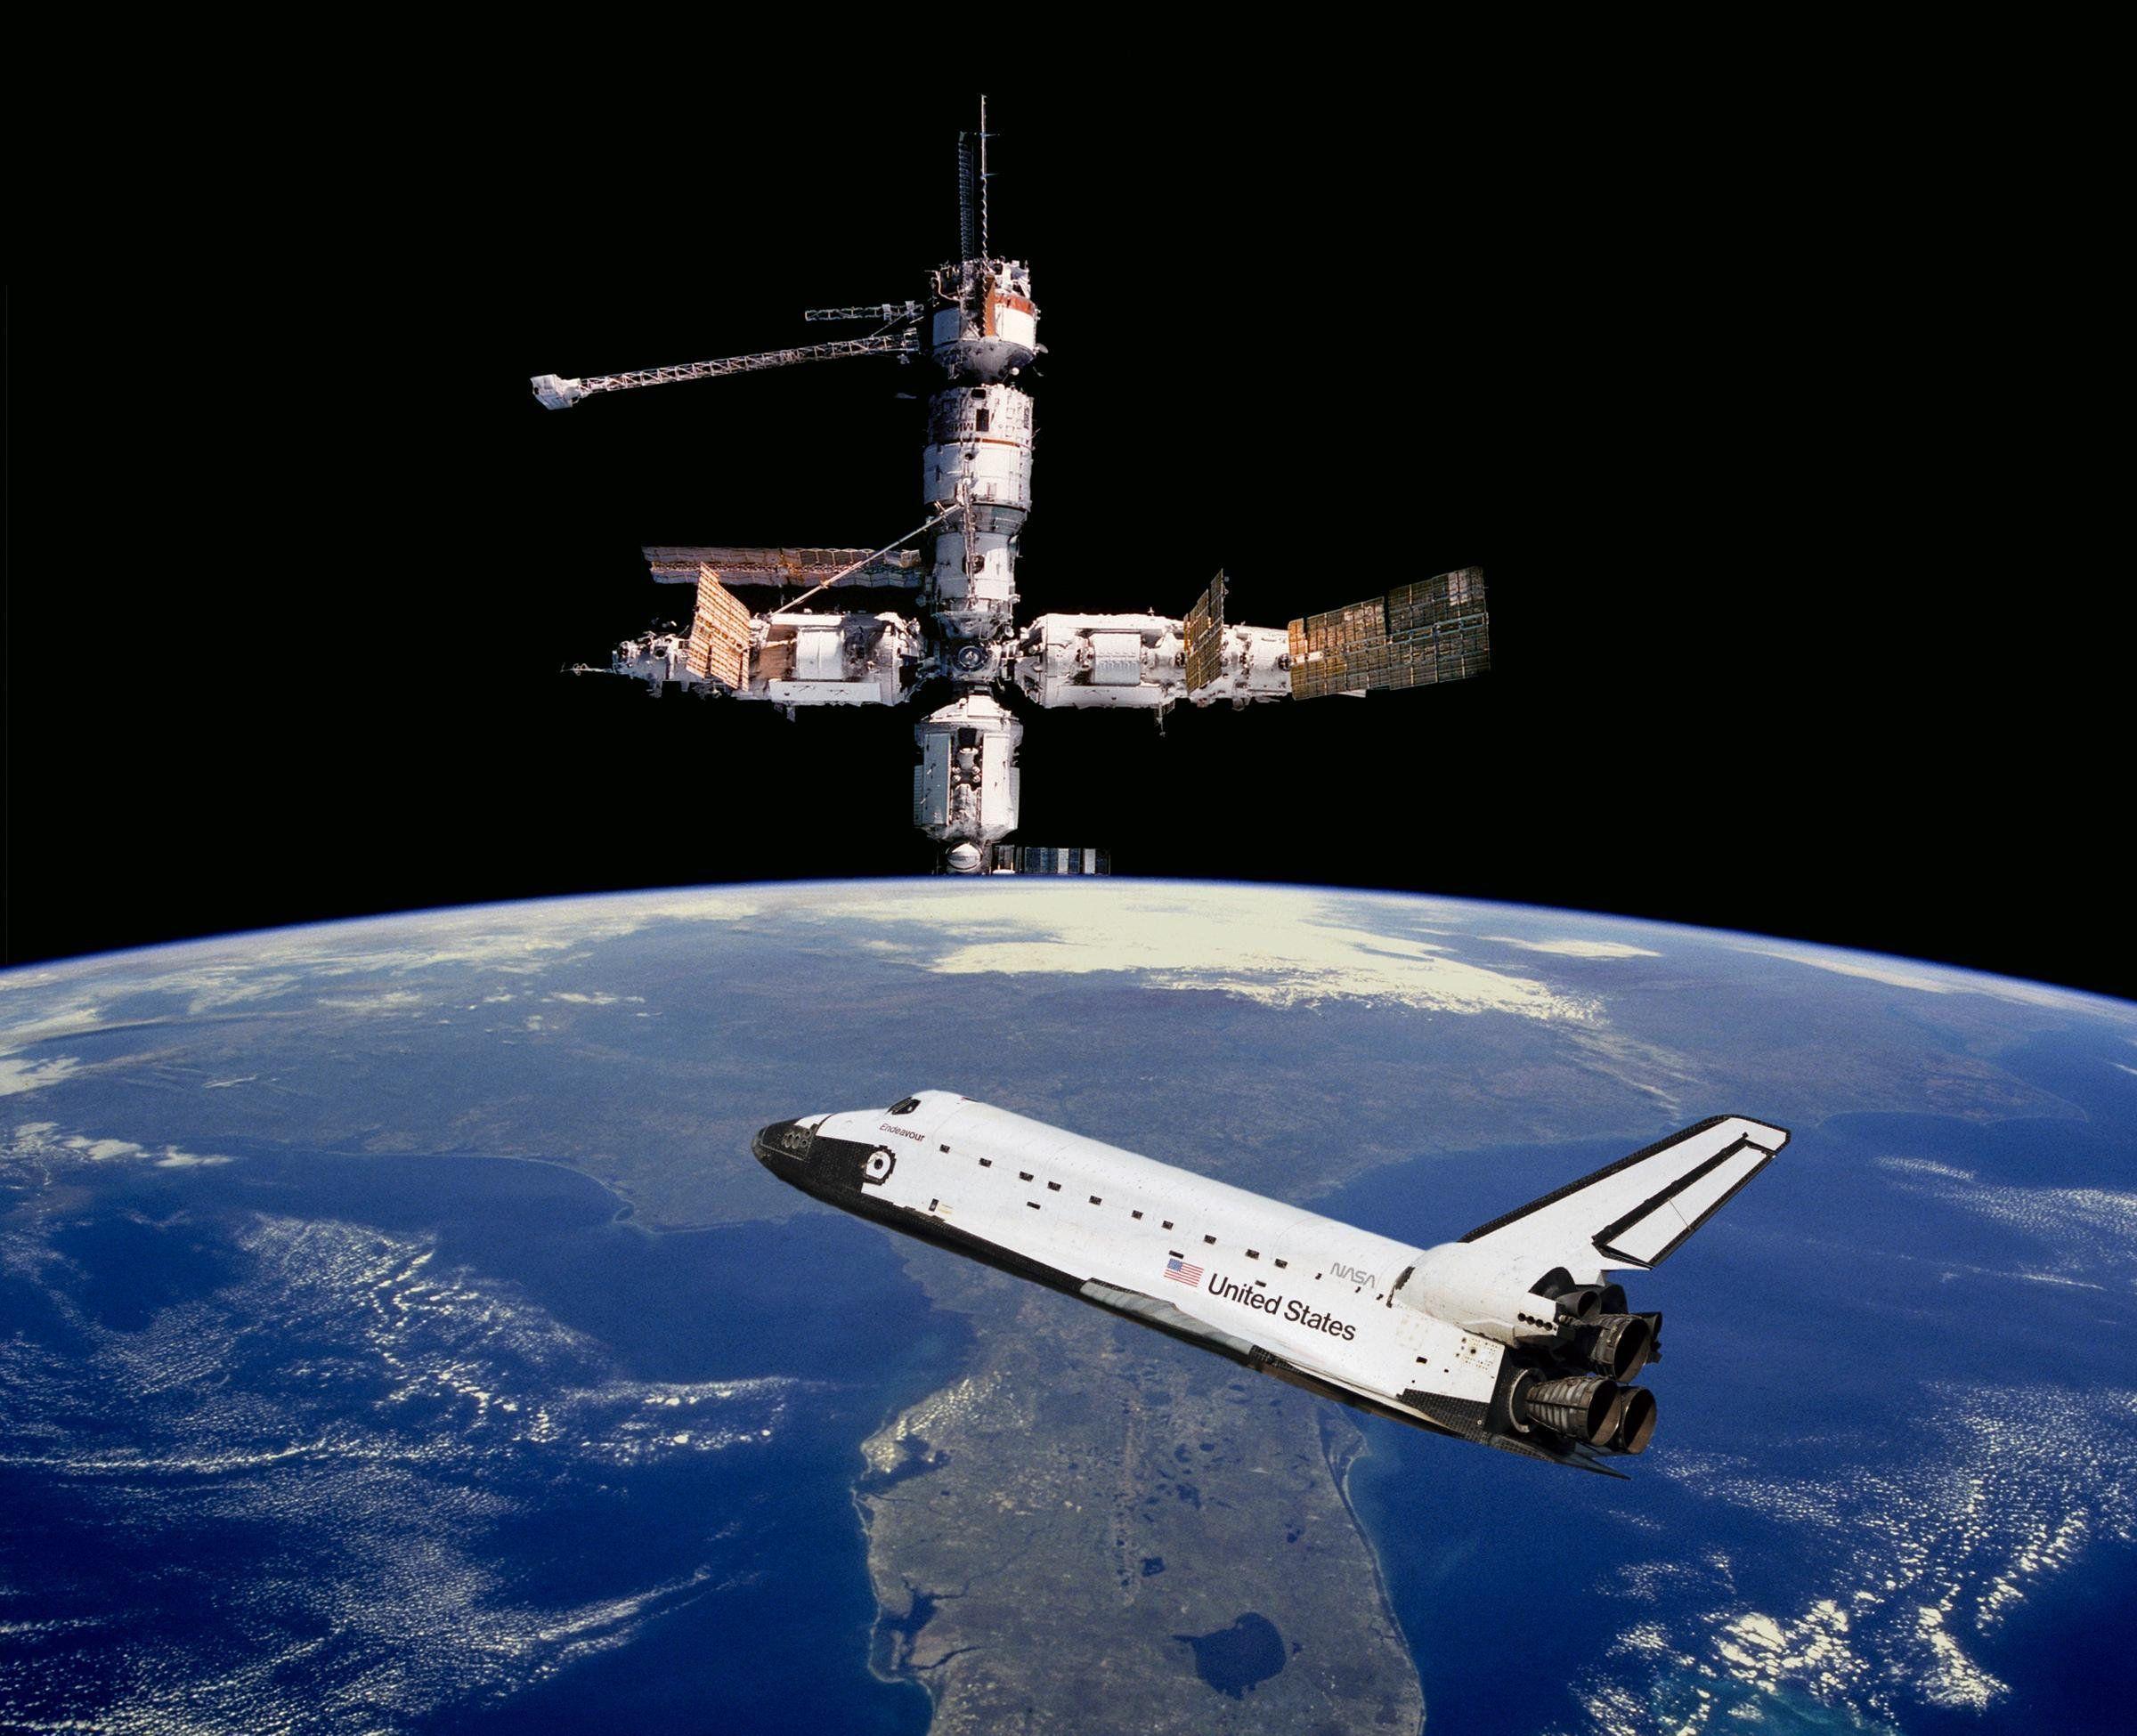 space shuttle columbia wallpaper - photo #15